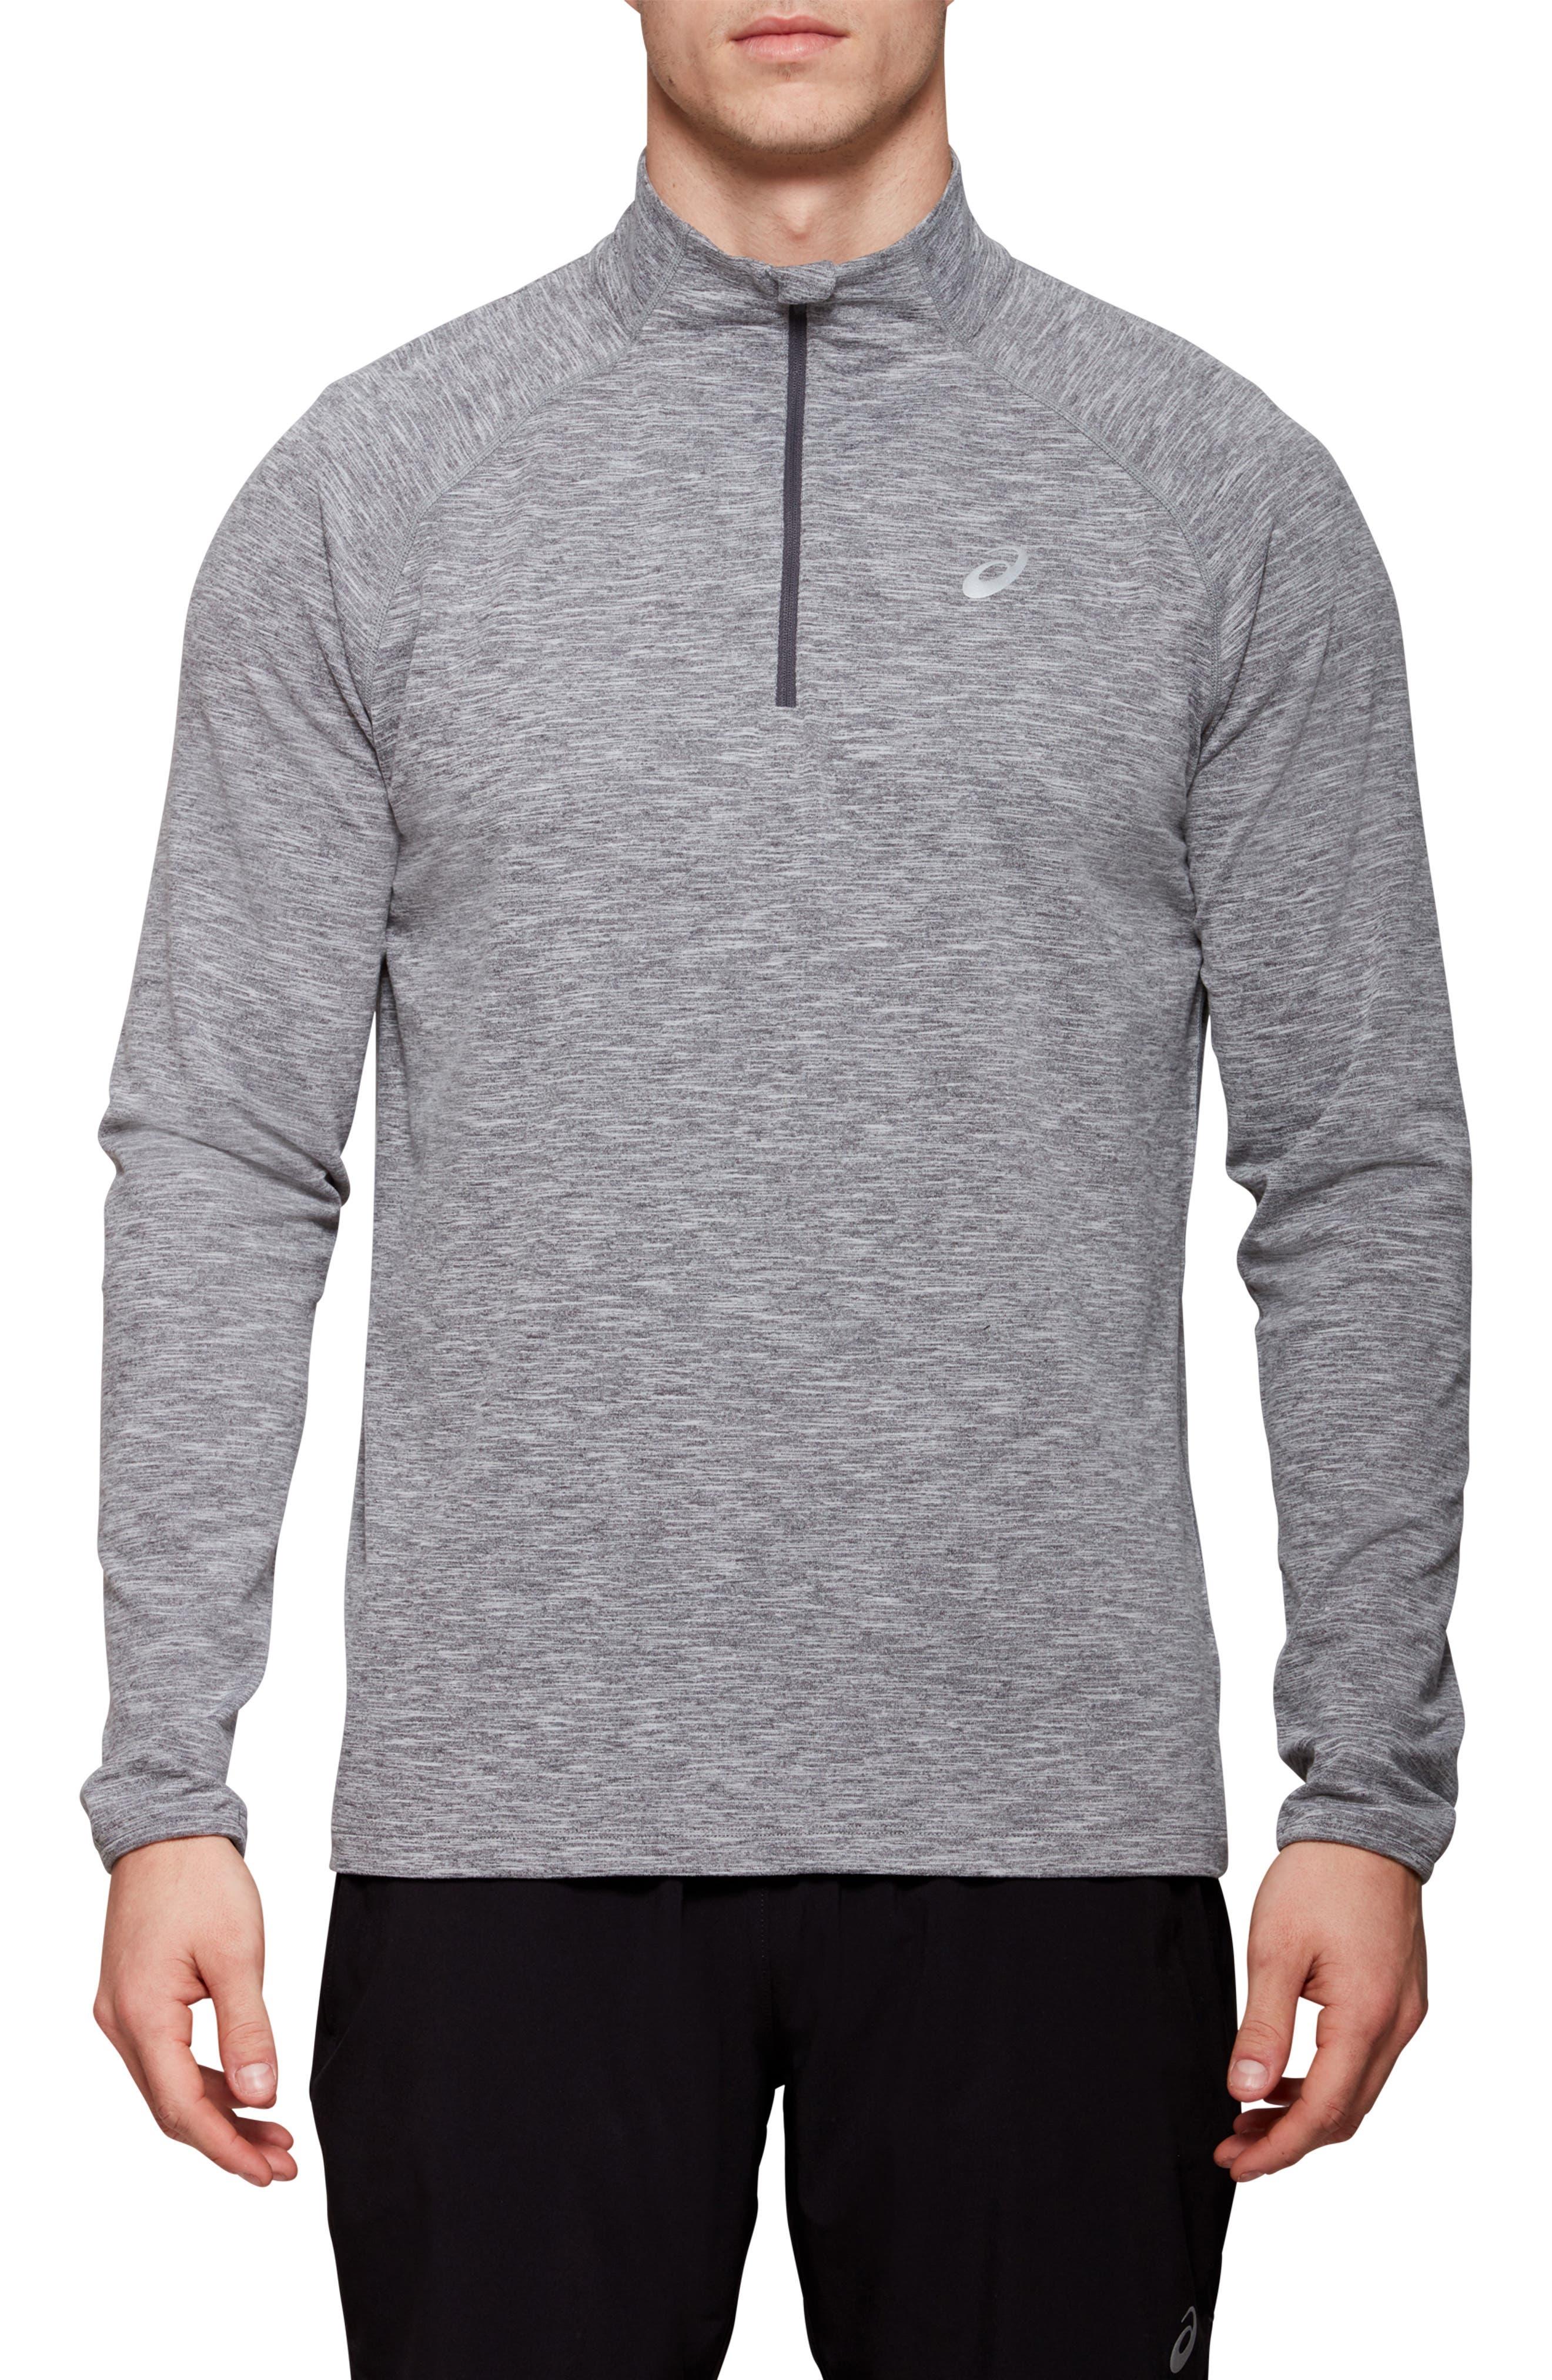 Men's Asics Doarai Quarter Zip Pullover